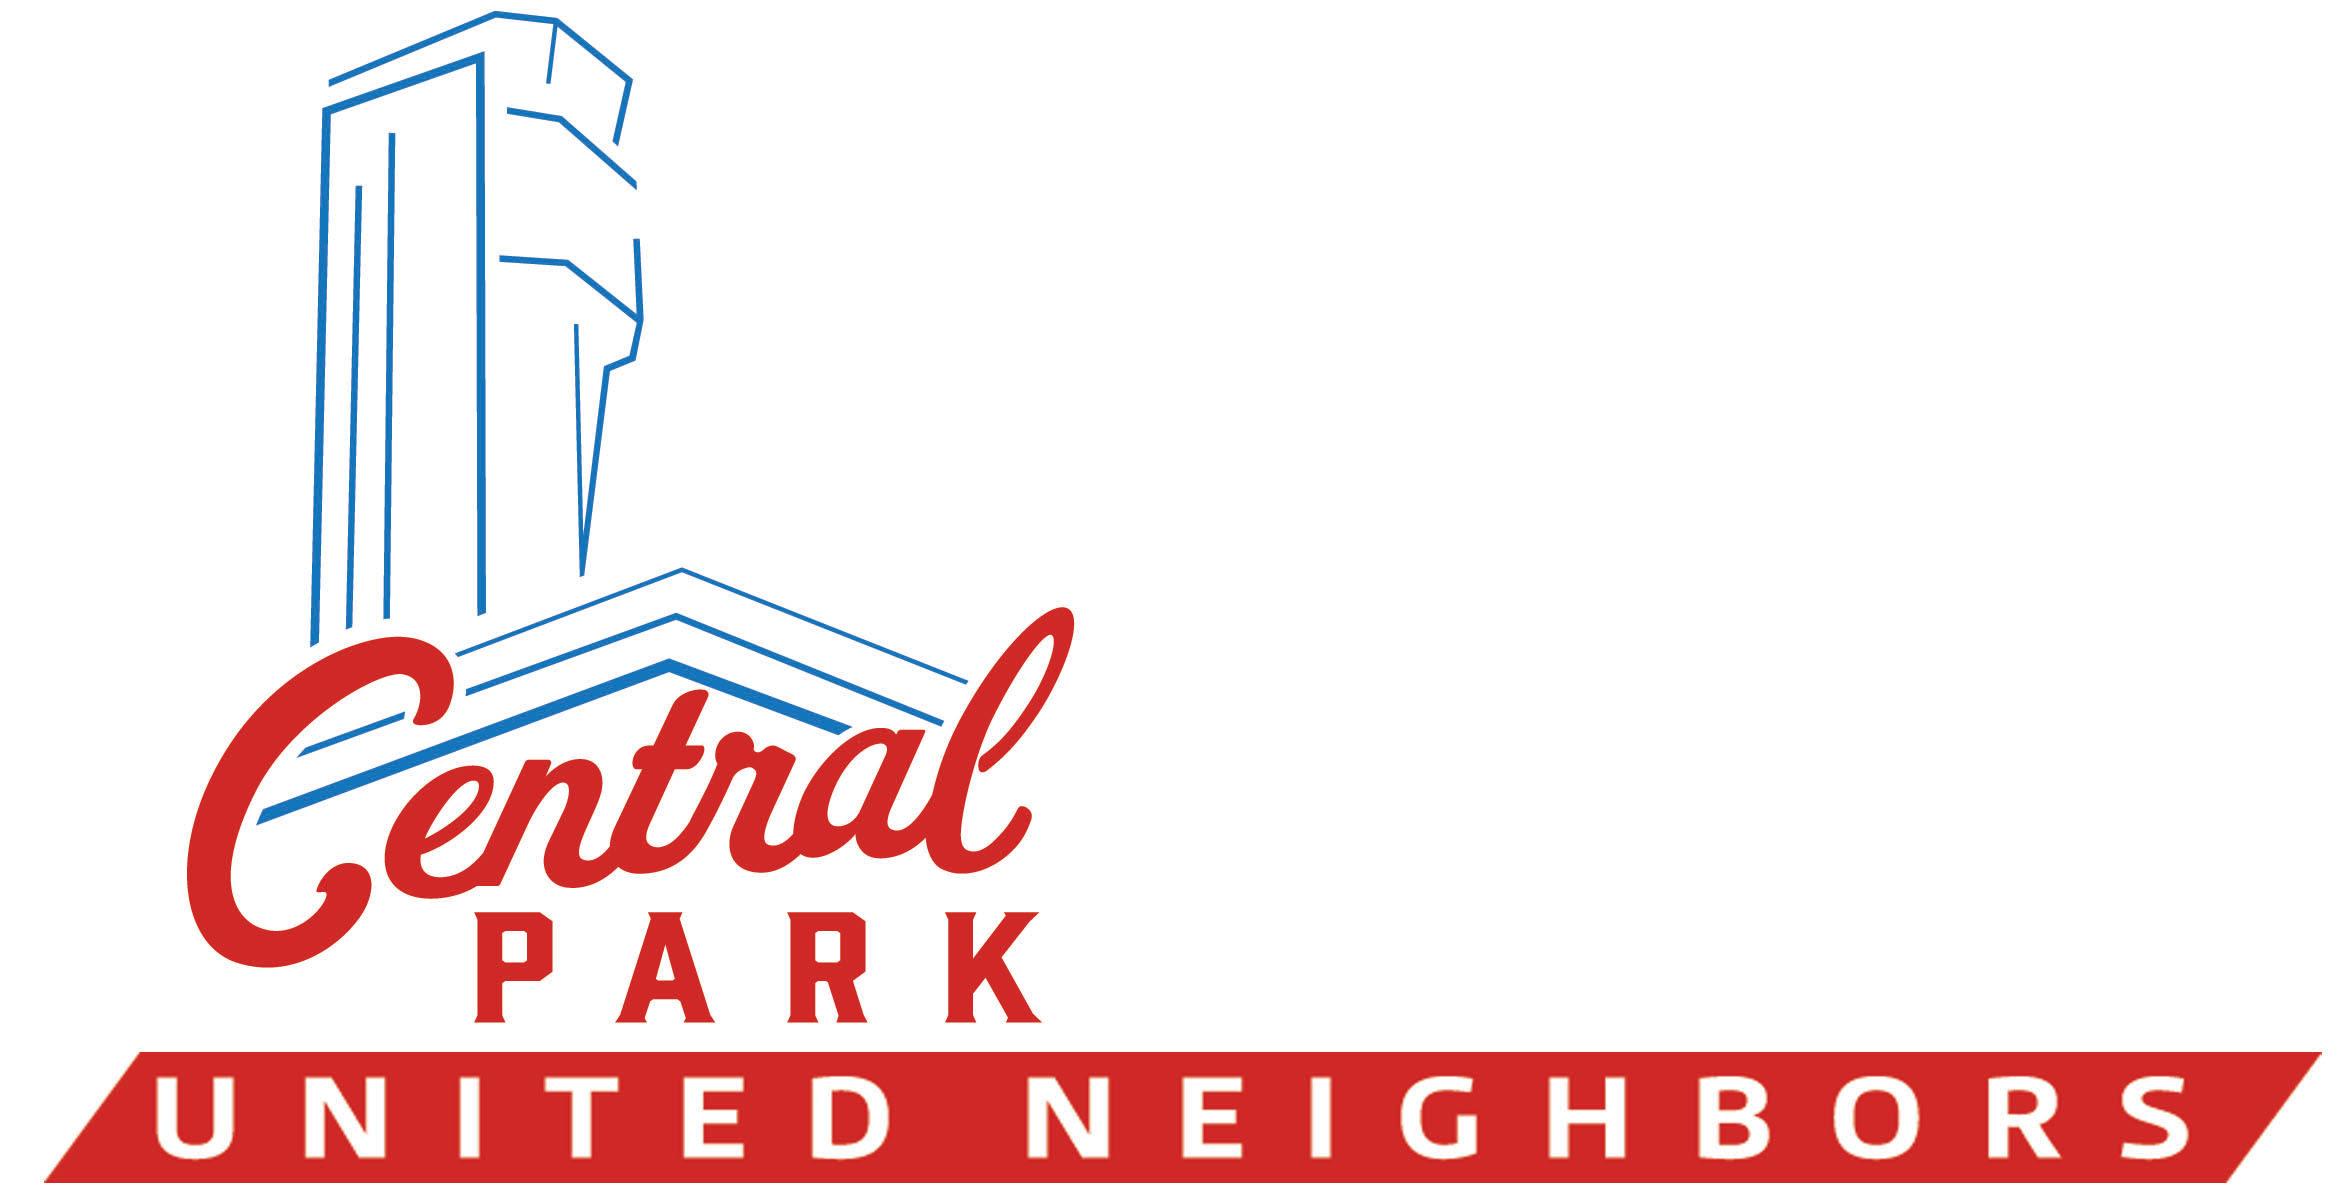 Central Park United Neighbors